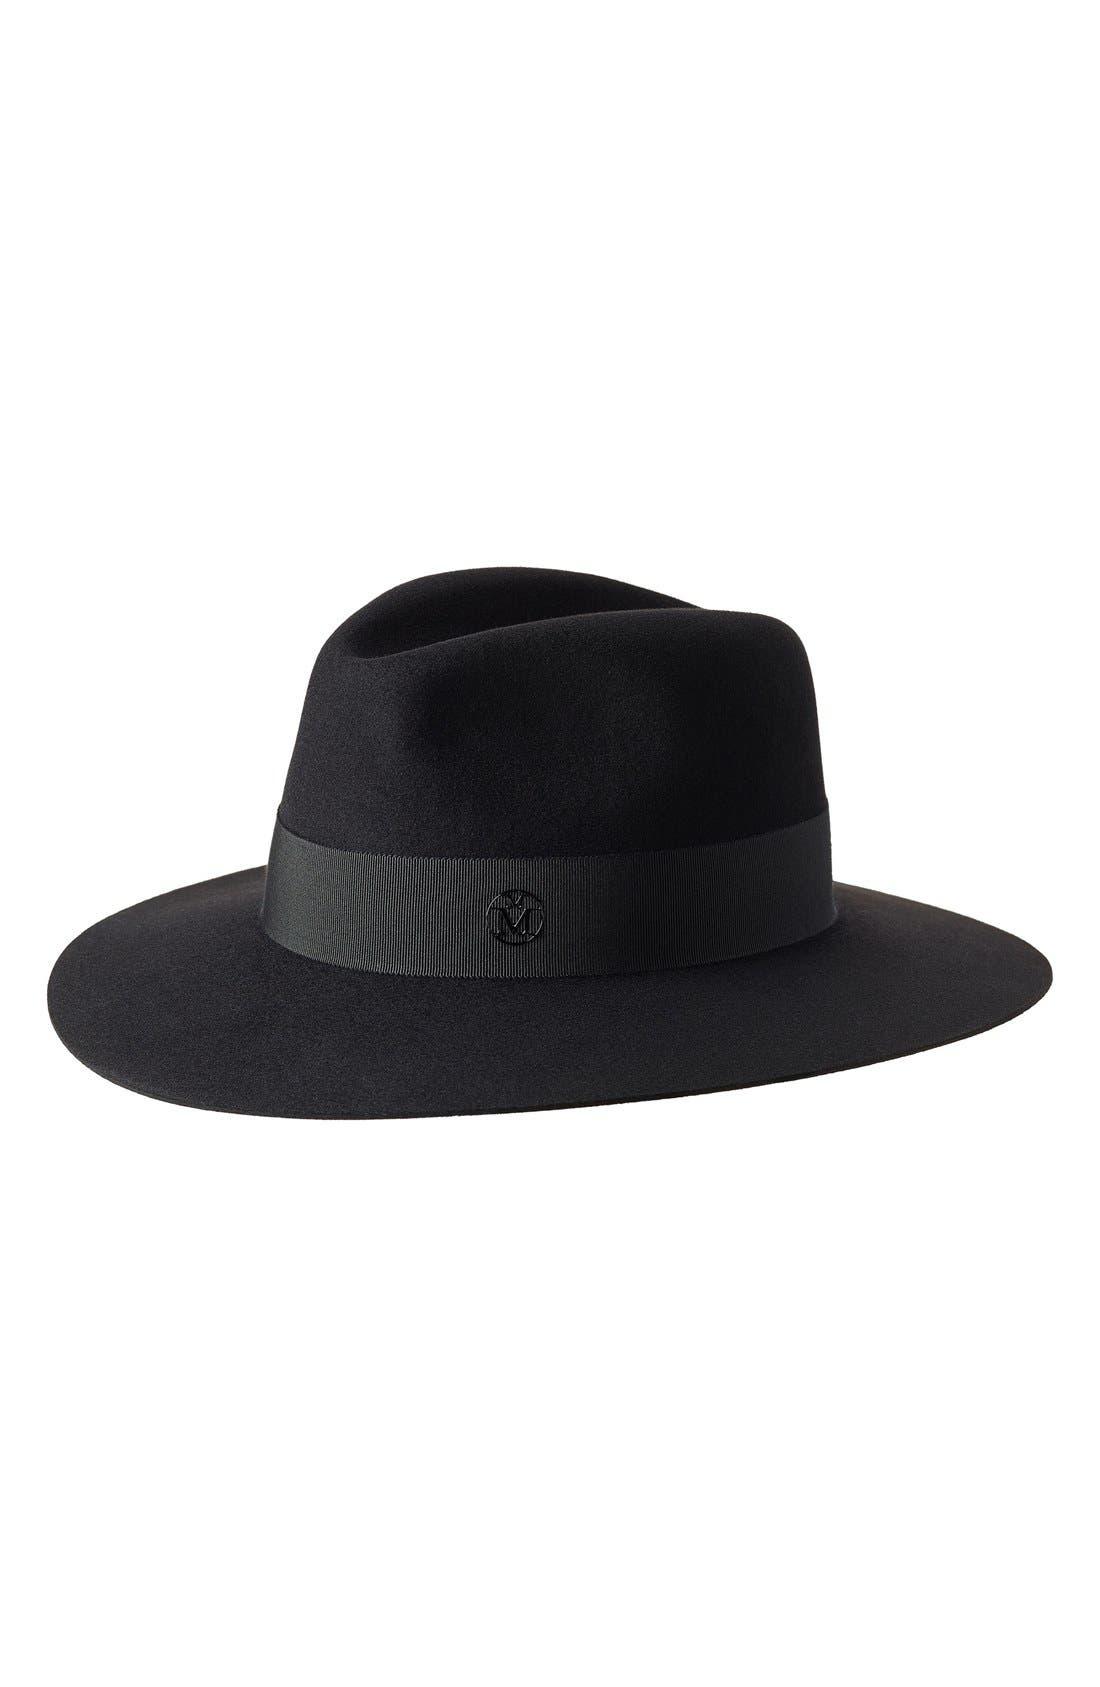 Alternate Image 1 Selected - Maison Michel Henrietta Fur Felt Hat